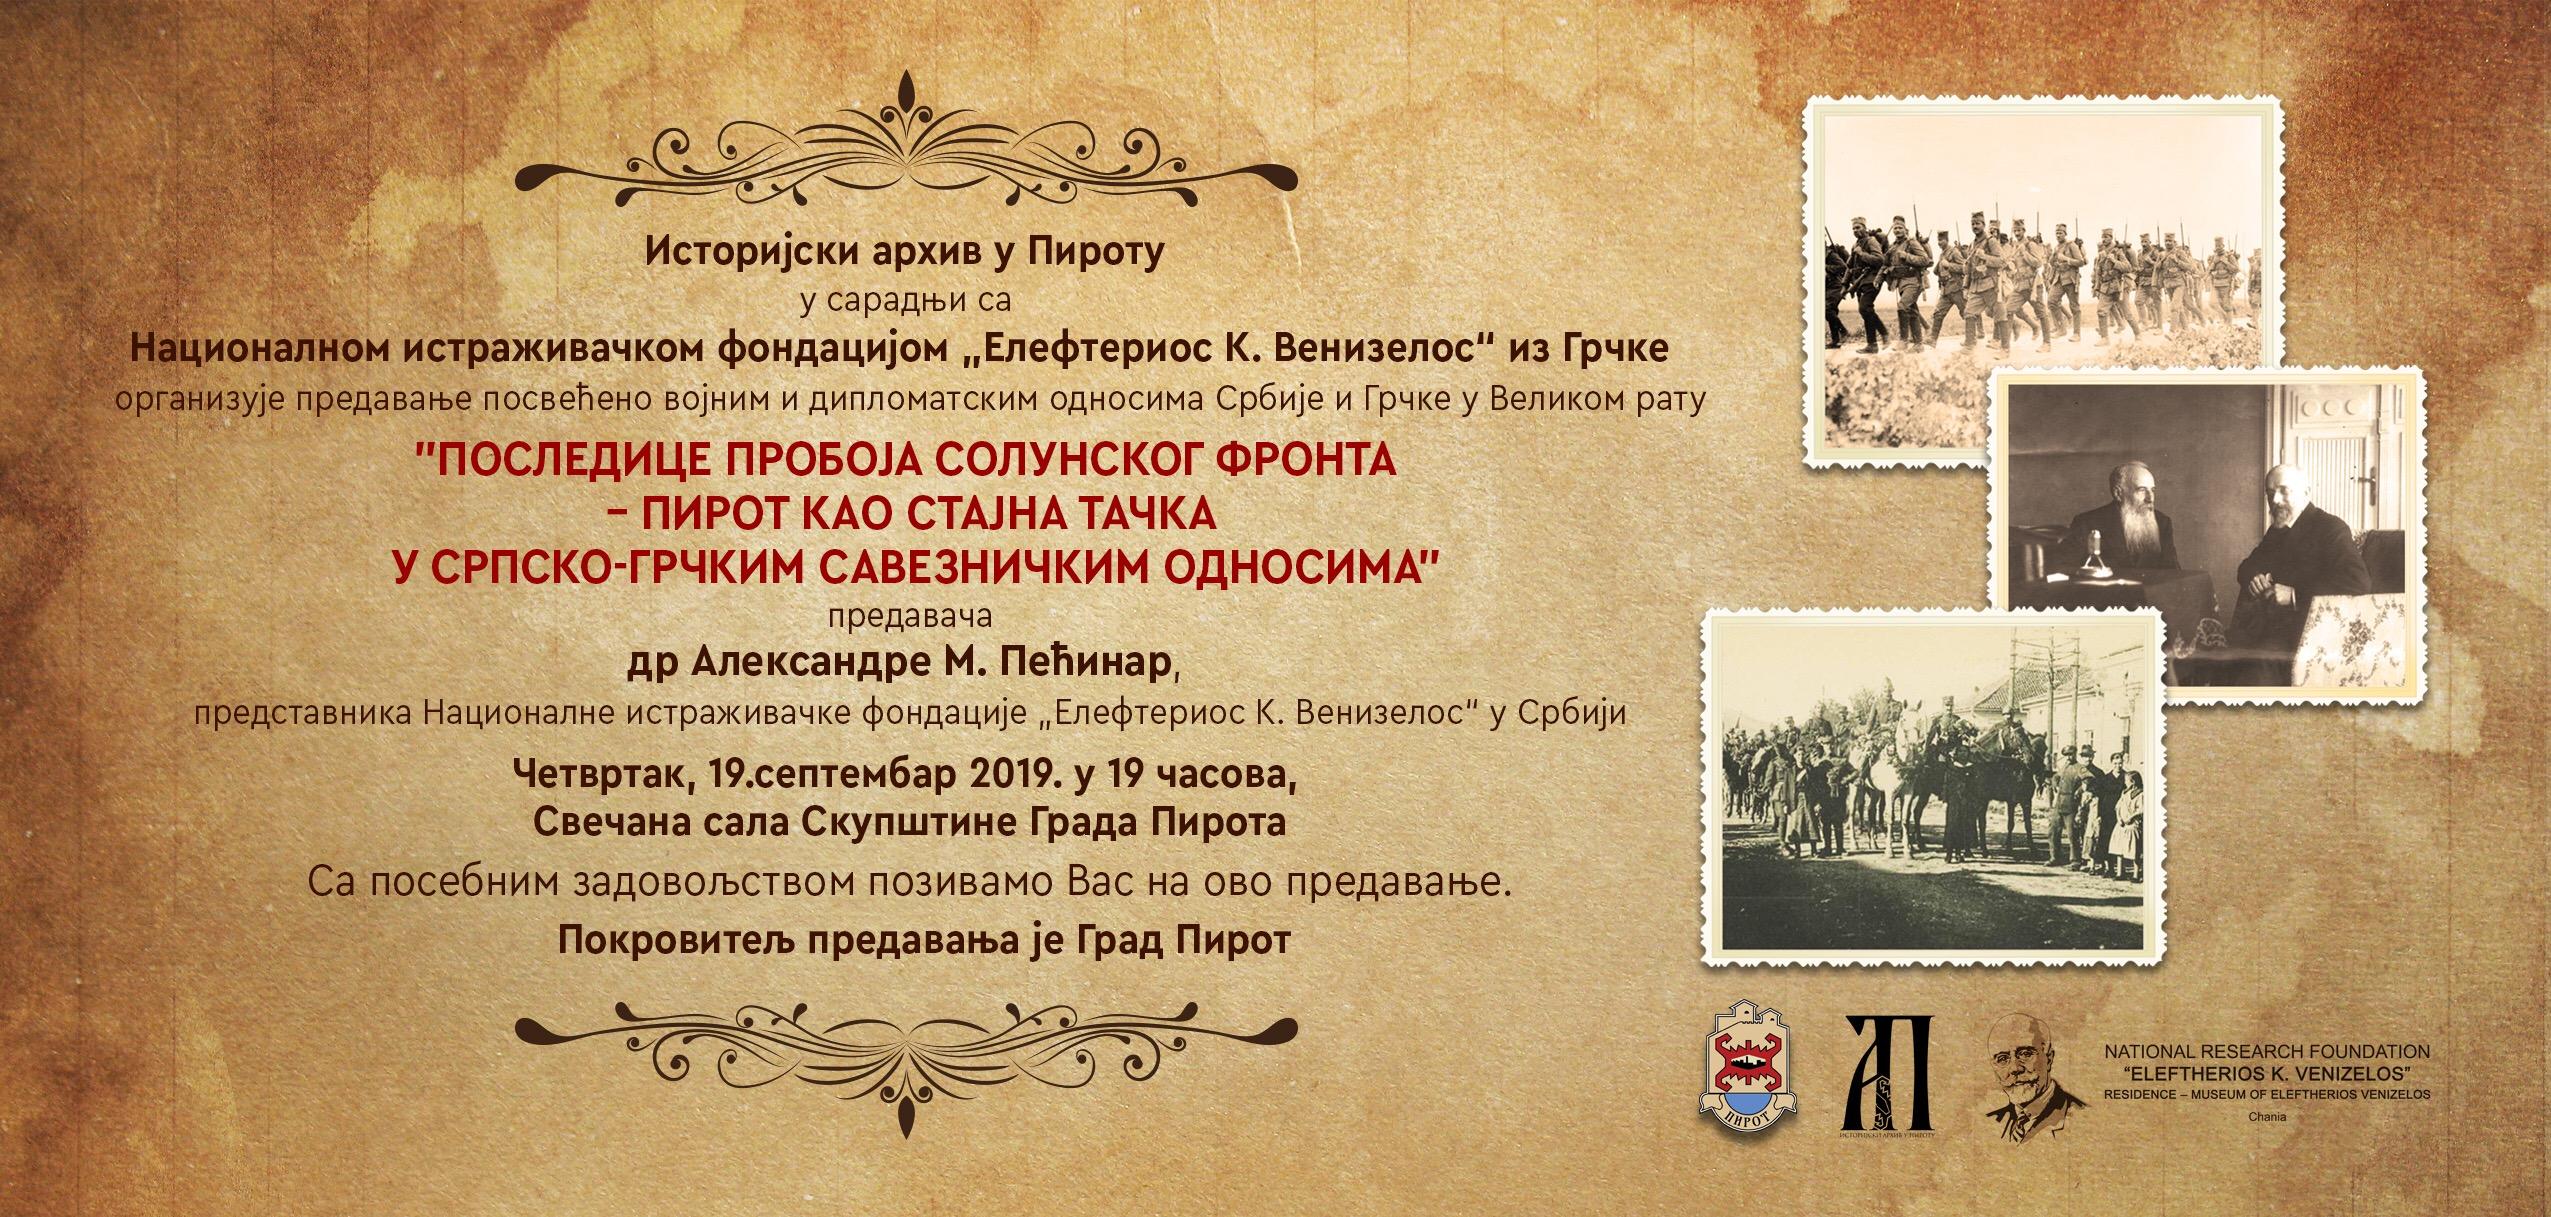 Photo of Predavanje o posledicama proboja Solunskog fronta